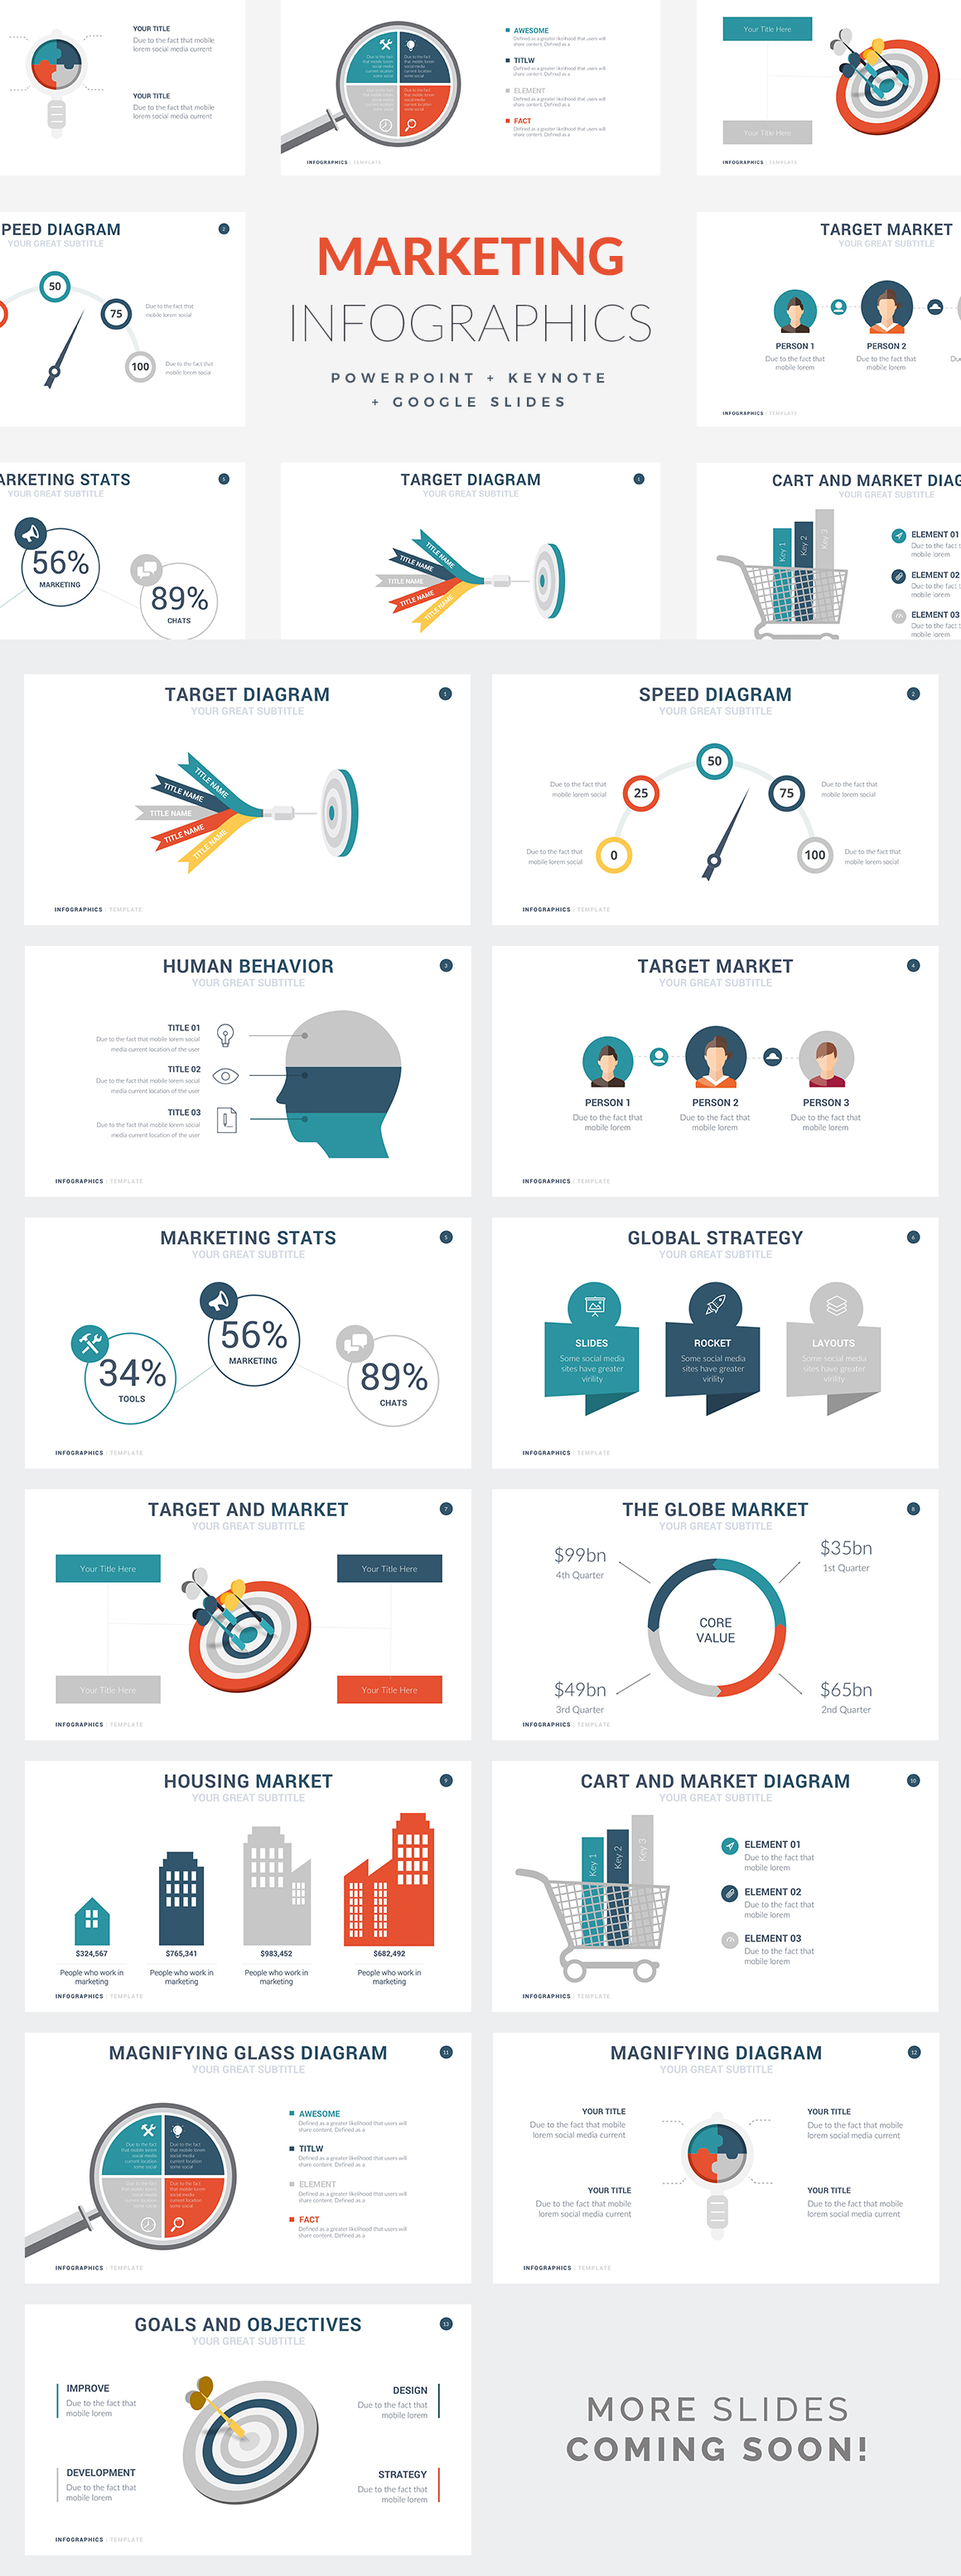 Marketing Infographic Templates - PowerPoint Templates - Keynote Themes - Google Slides